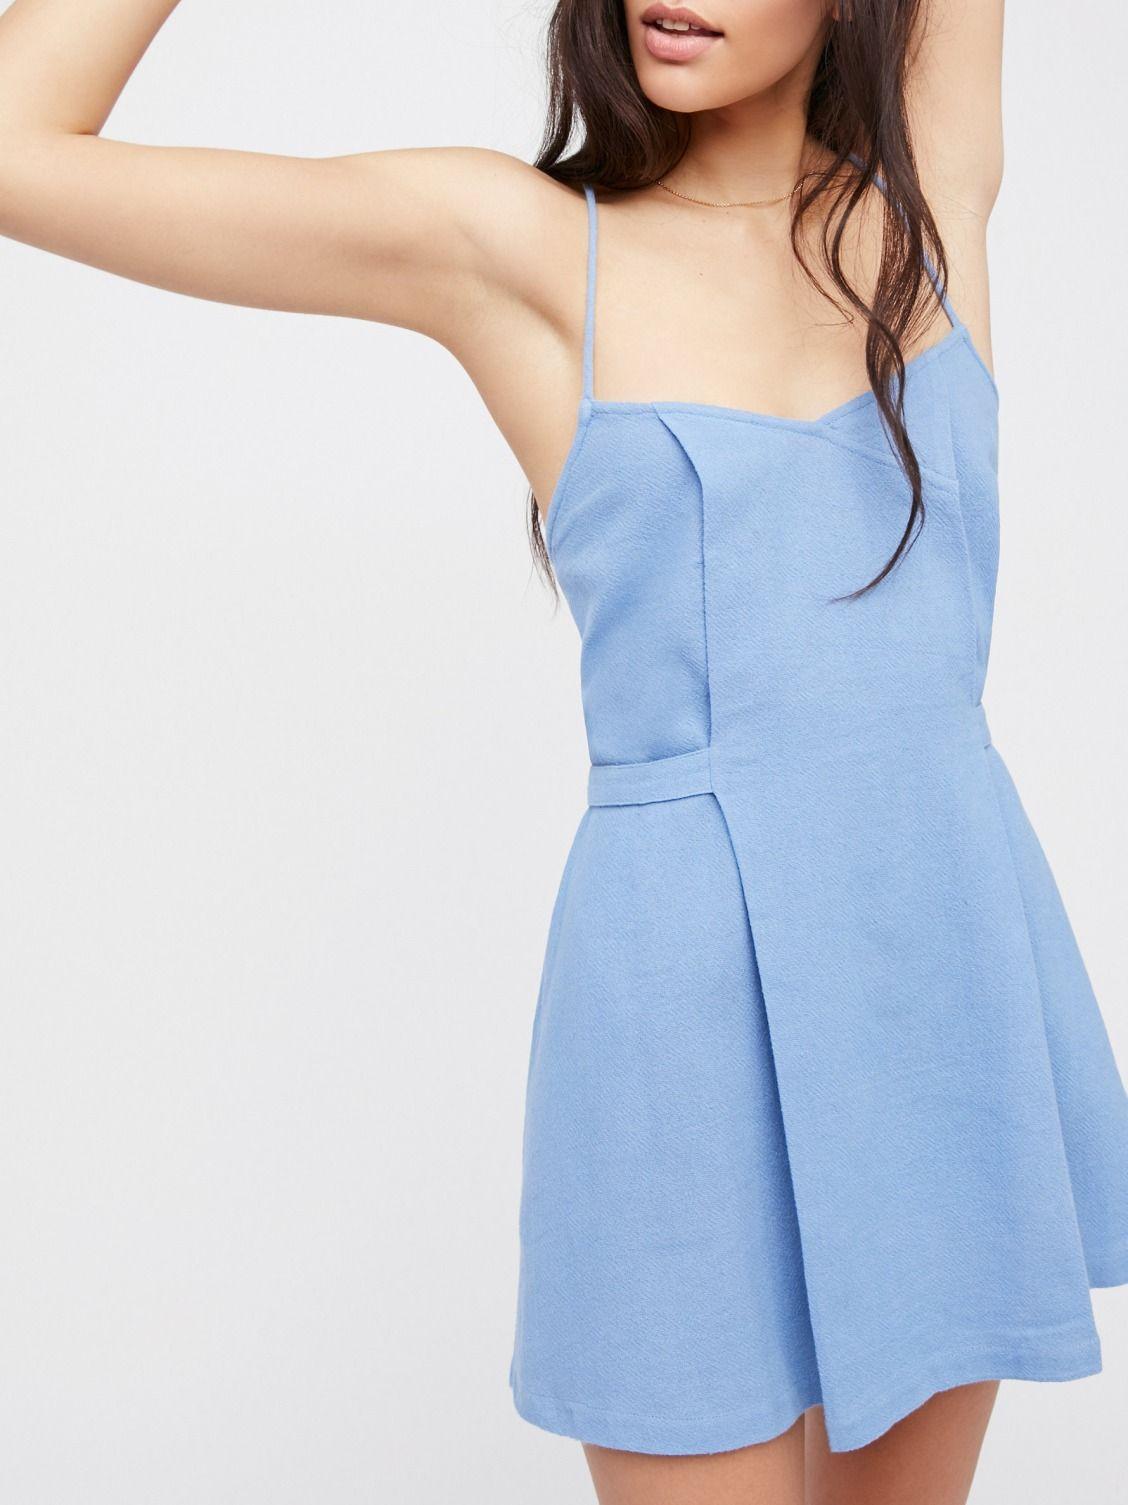 Melt Your Heart Mini Dress | Clothing boutiques and Mini dresses